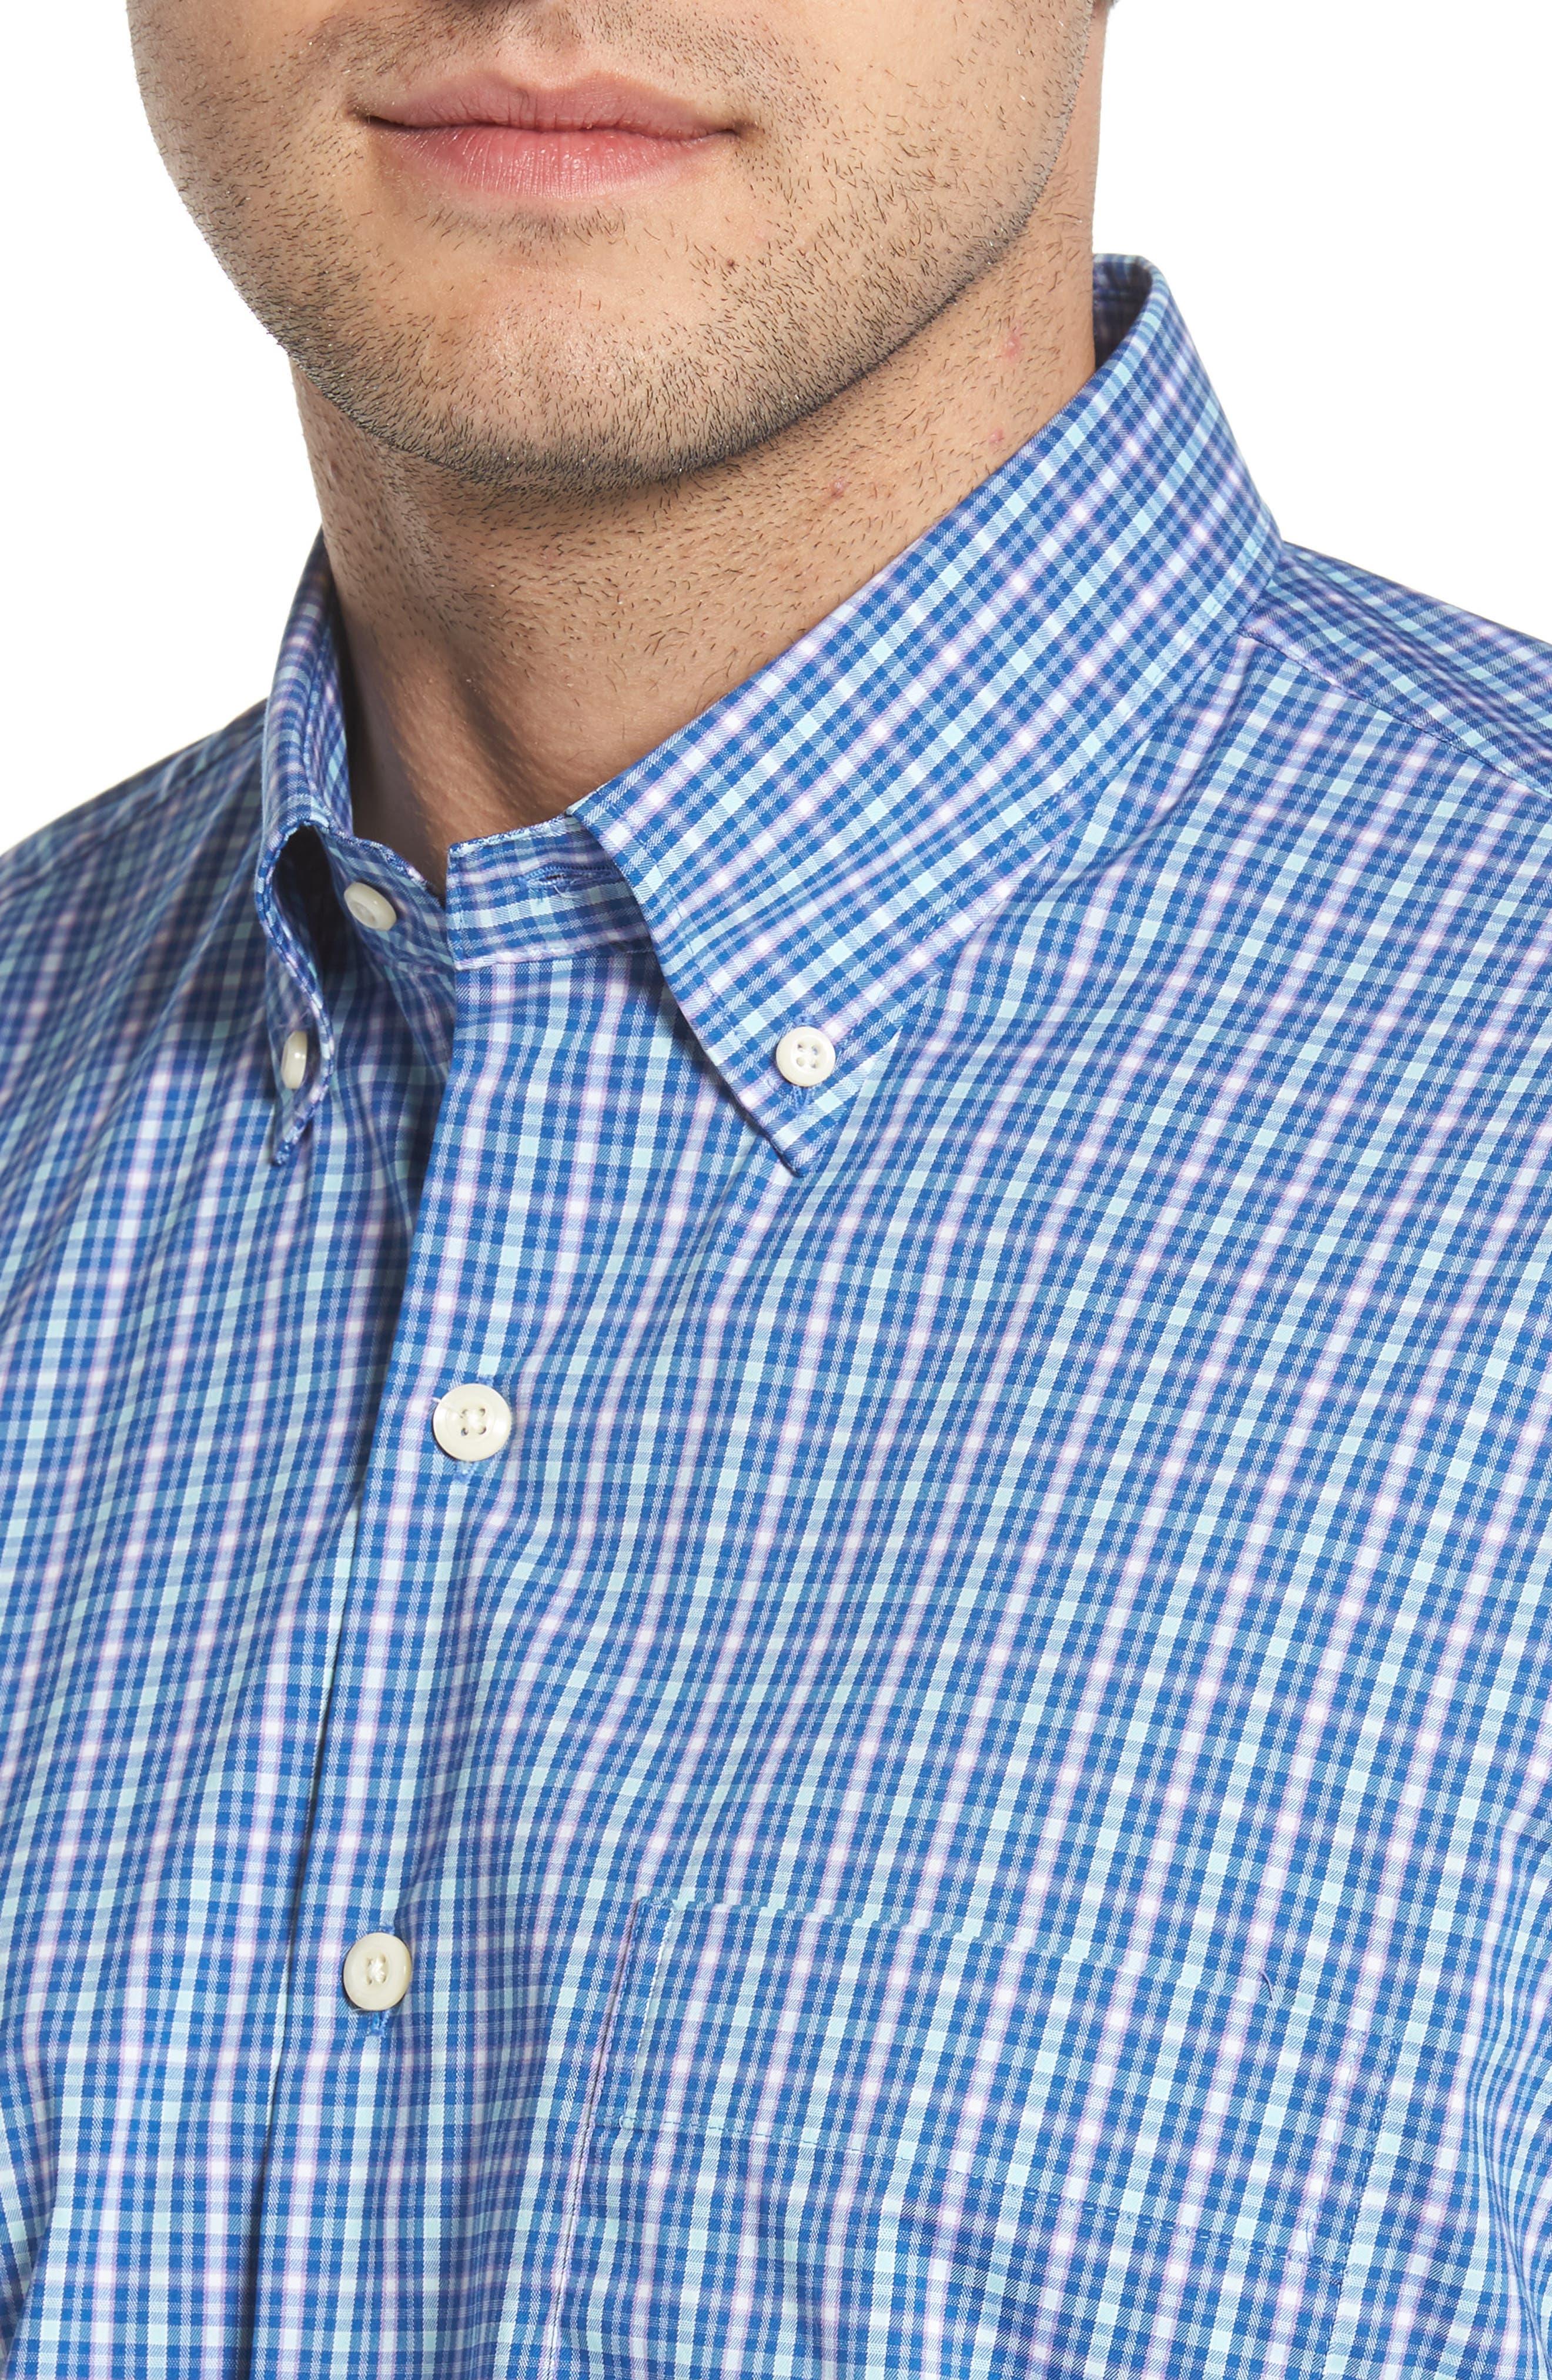 Crown Comfort Finch Multicheck Sport Shirt,                             Alternate thumbnail 4, color,                             422